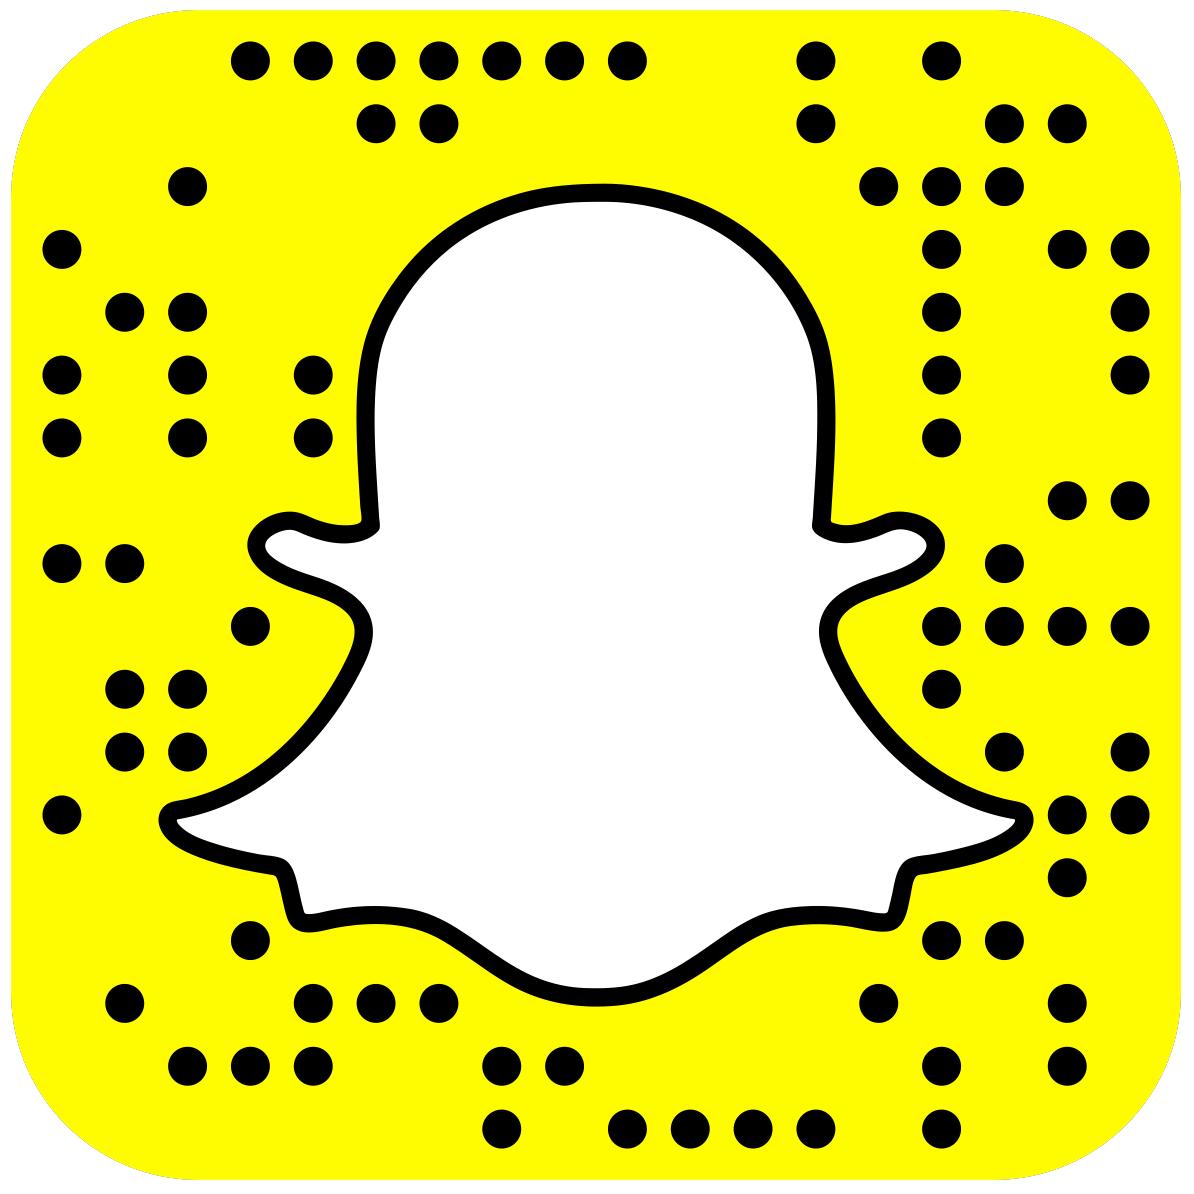 Jenna Dewan Tatum Snapchat username